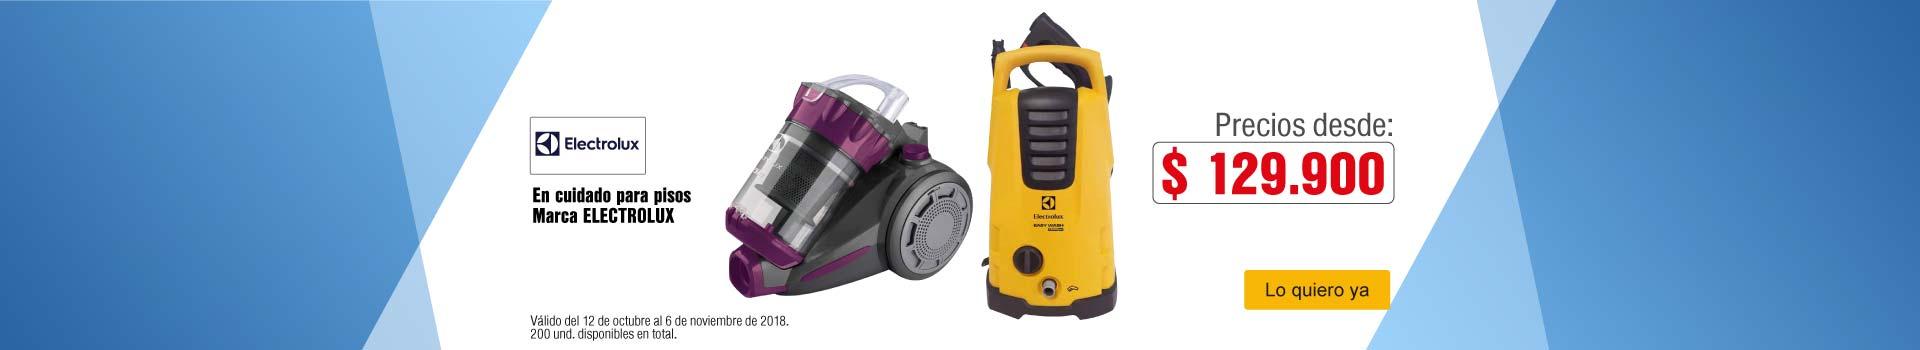 AK-KT-BCAT-1-MENORES-CPISOS-PP-ELECTROLUX-CPISOS-OCTUBRE-20